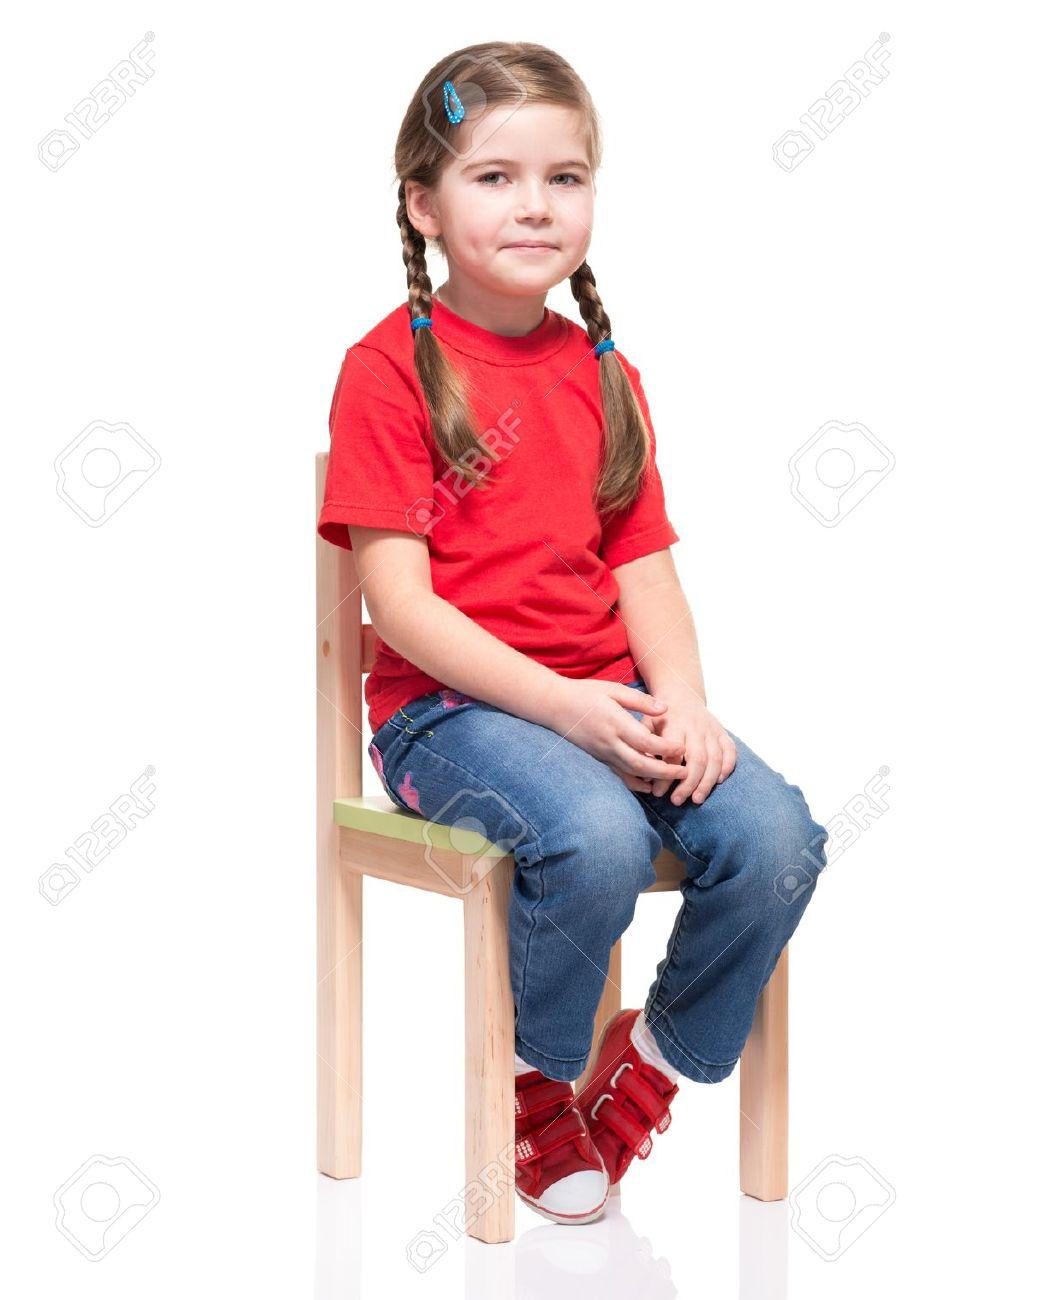 1005b14c1 Foto de archivo - Niña vestida de rojo t-corto y posando en la silla sobre  fondo blanco